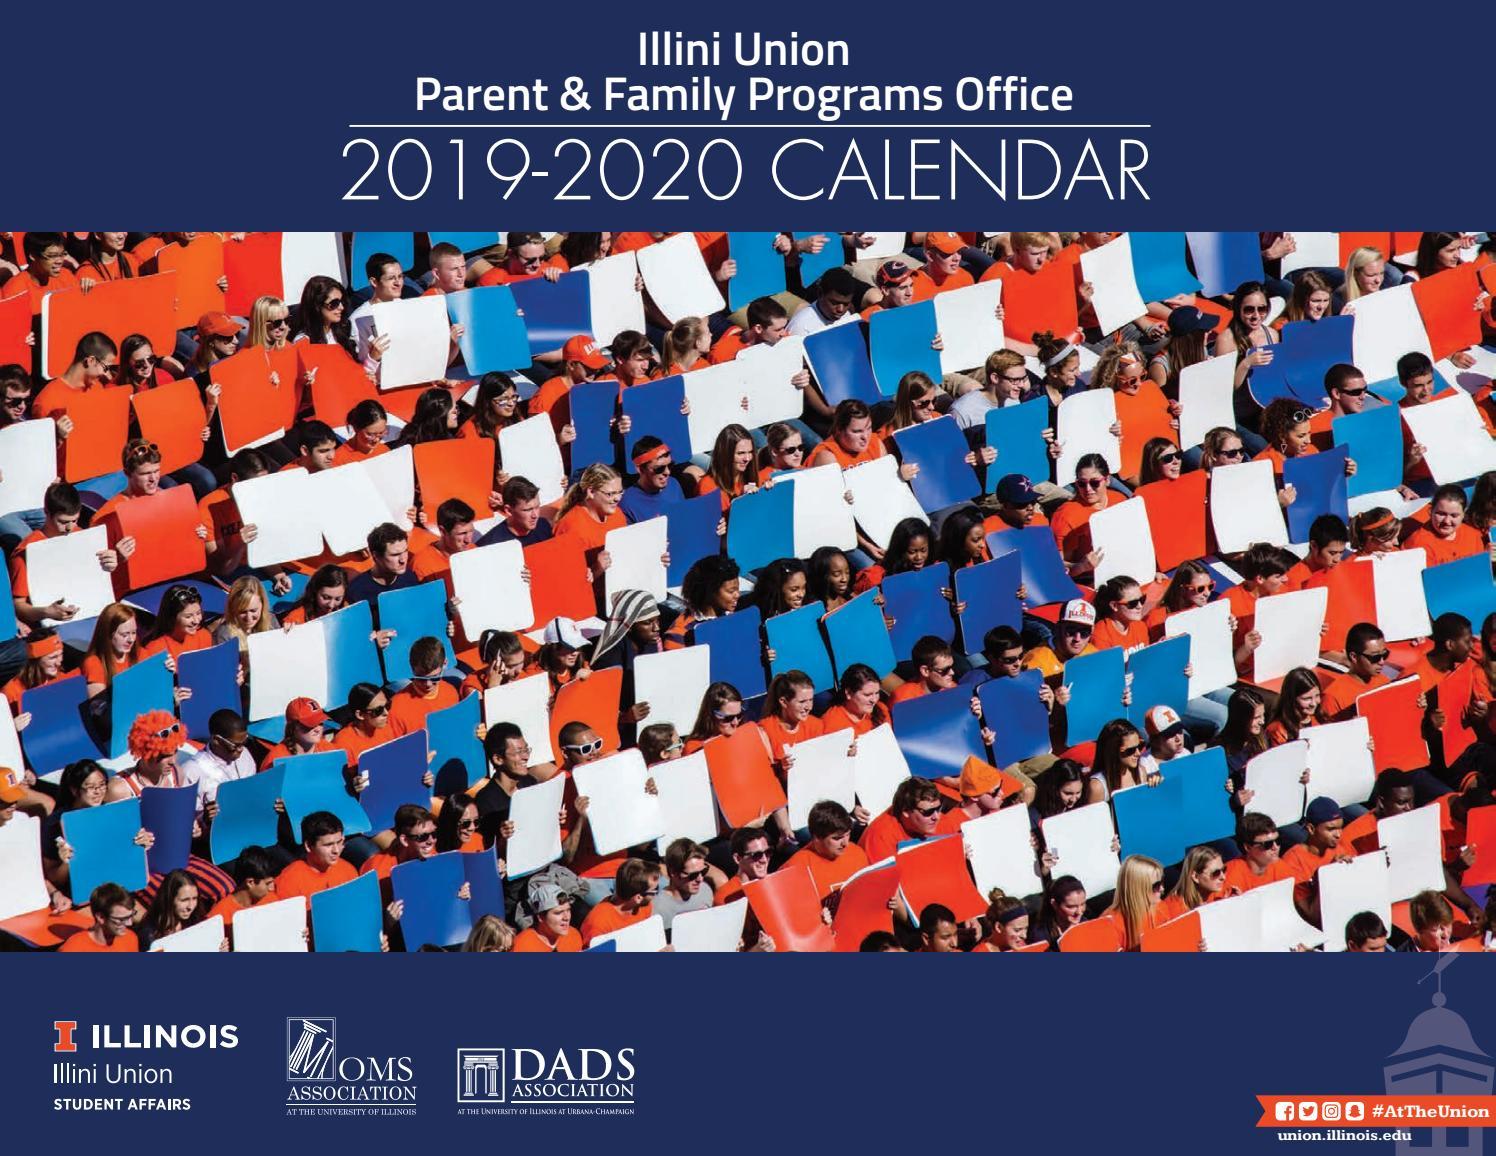 Pfpo Calendar 2019 2020Illini Union – Issuu Throughout University Of Akron Spring 2020 Calendar